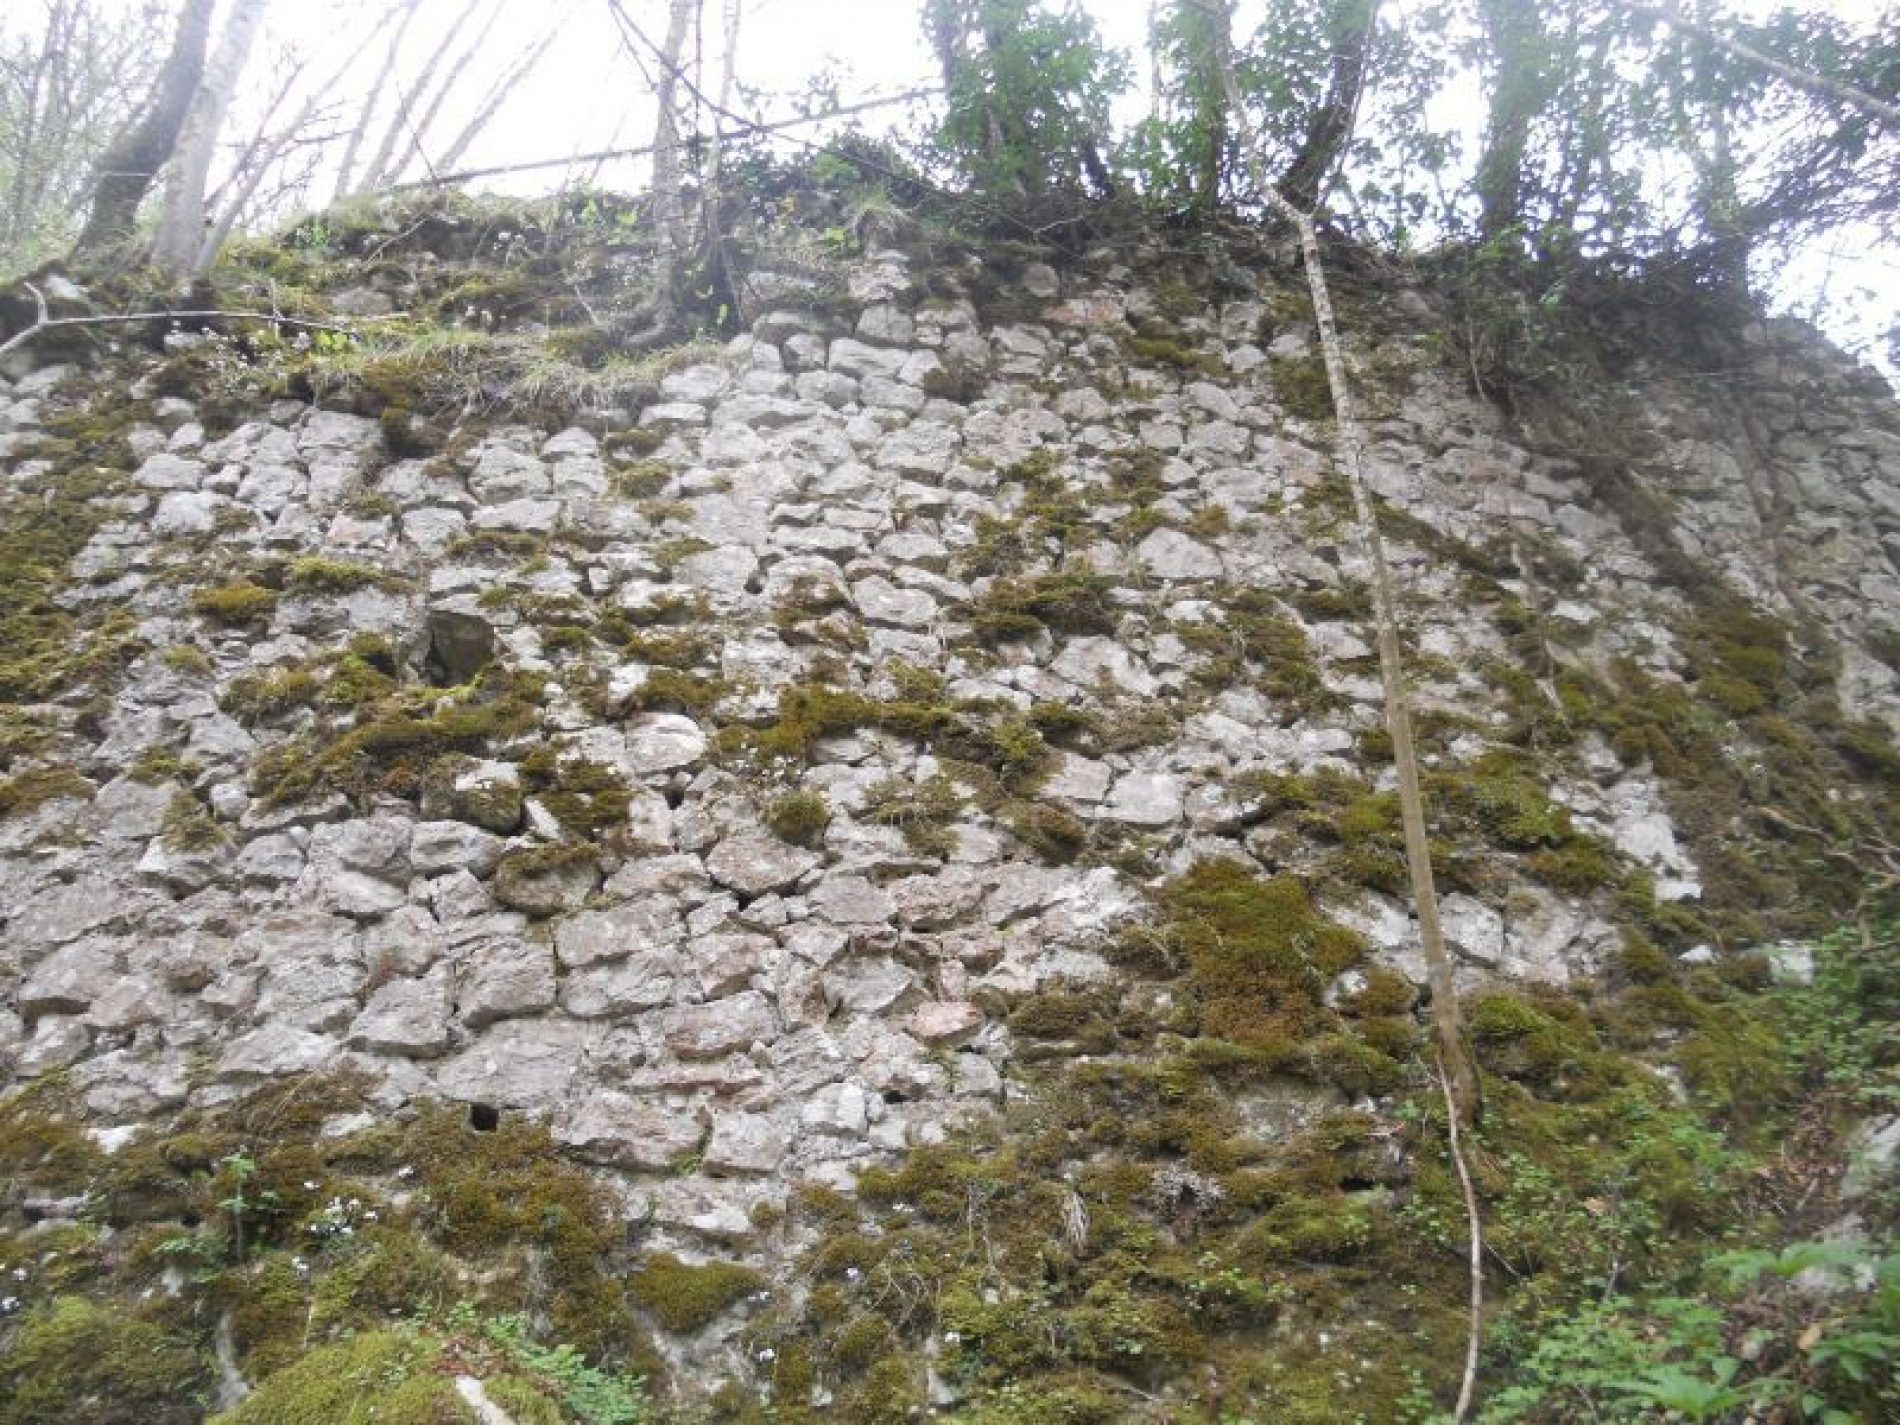 Skrivena Bosna: Ostaci Perin grada mirišu na davnu prošlost